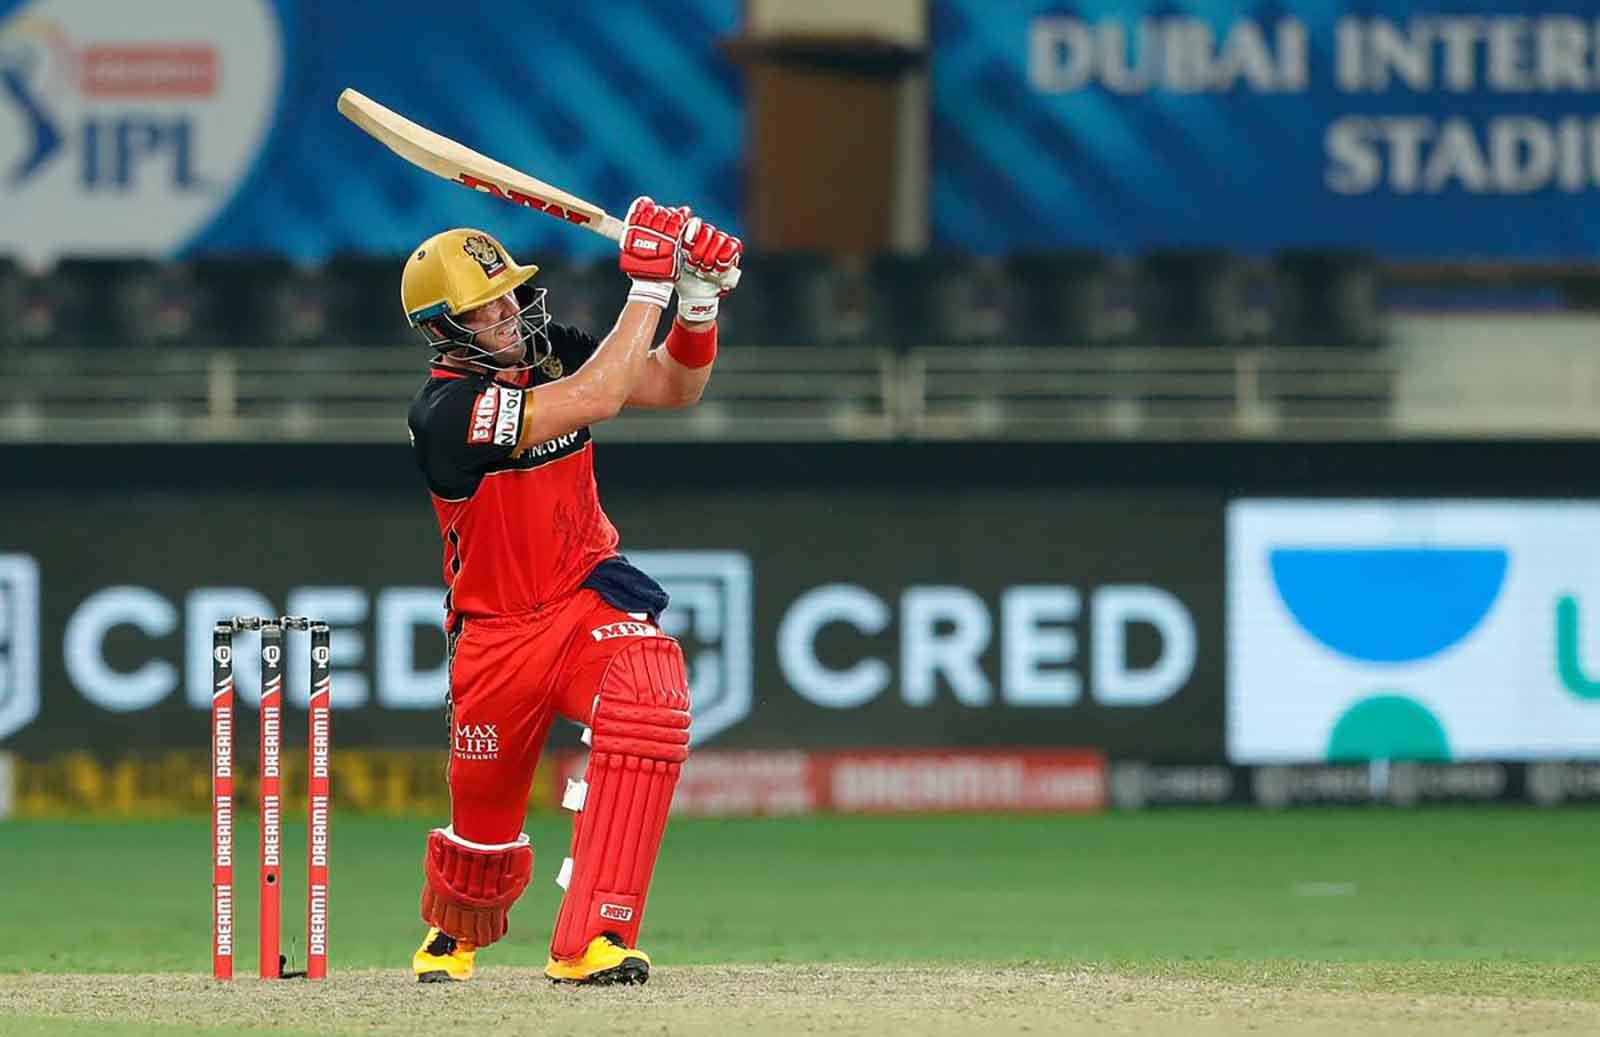 AB de Villiers glittery 51 runs off 30 balls knock against Sunrisers Hyderabad